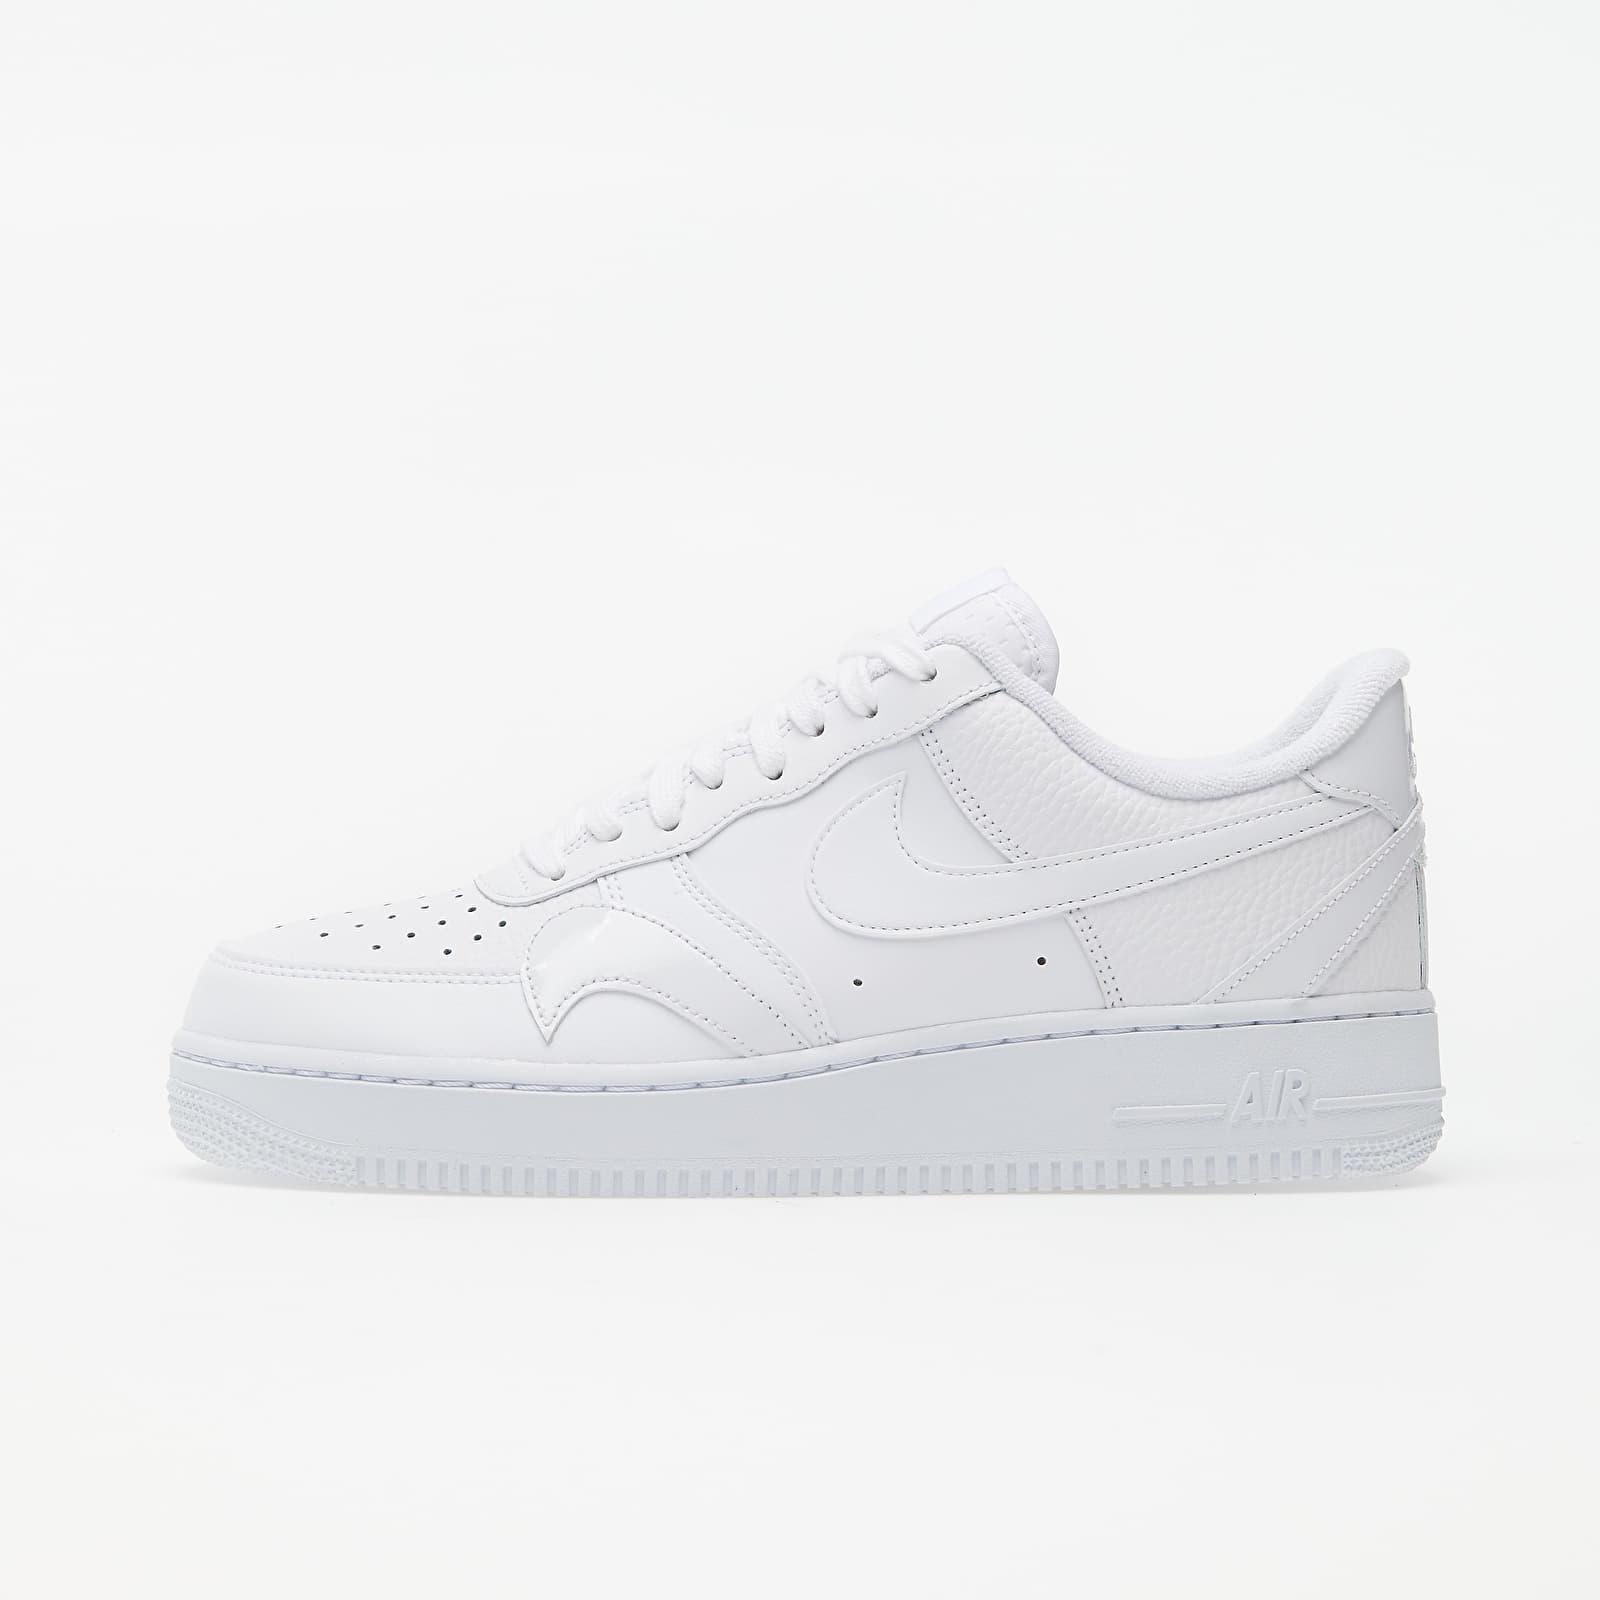 Nike Air Force 1 '07 LV8 White/ White-White CK7214-100